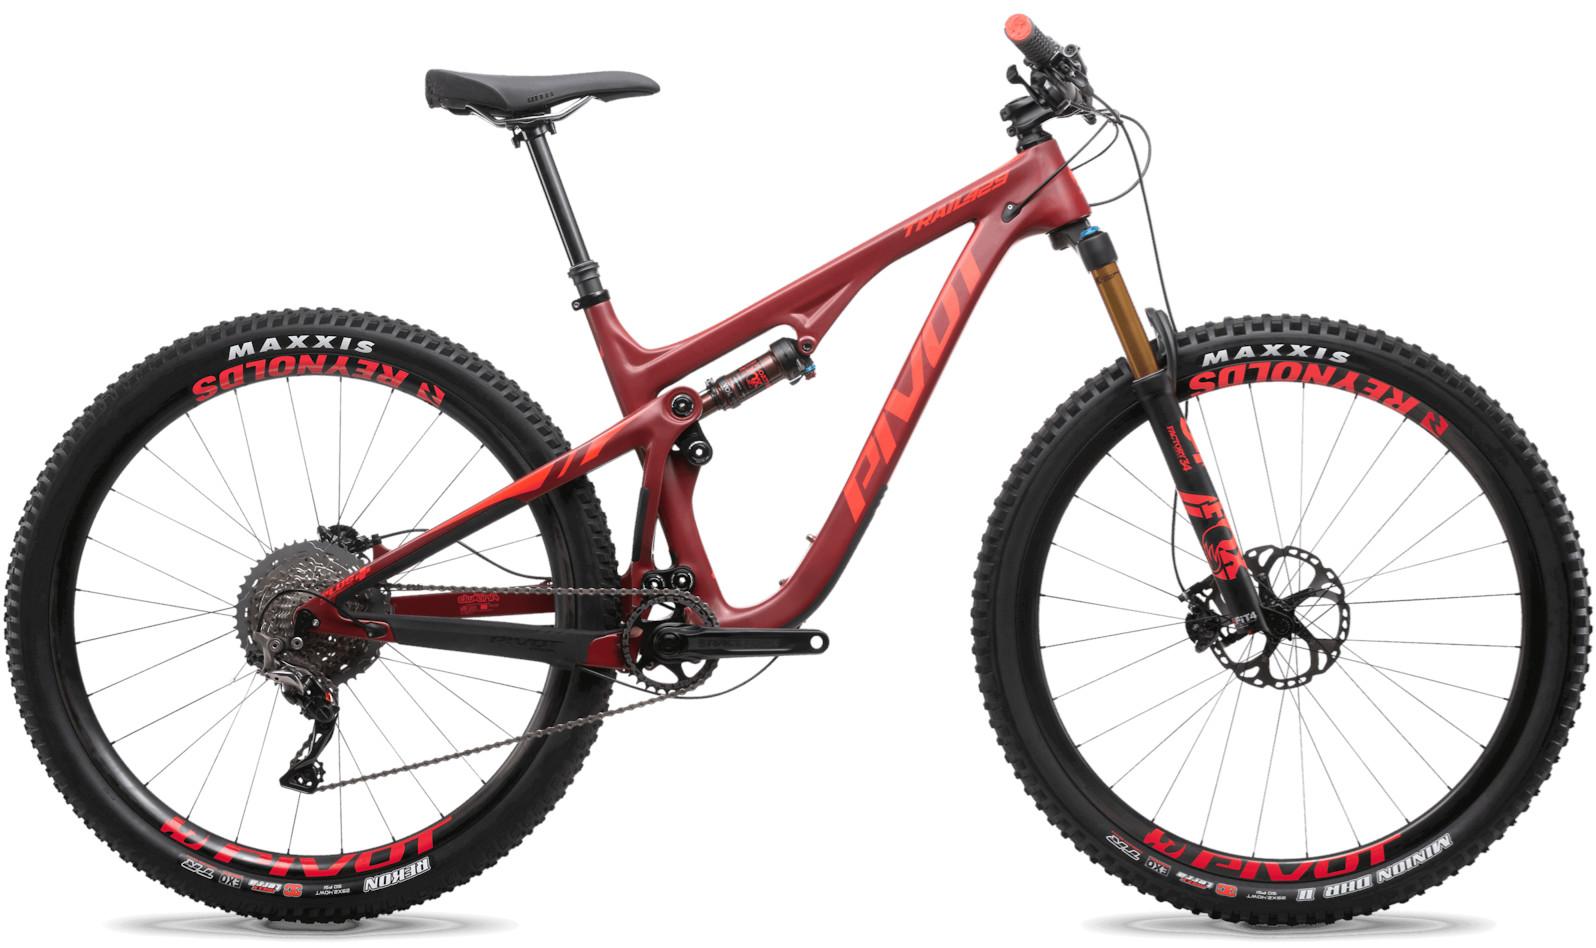 2020 Pivot Trail 429 Crimson (29 Team XTR build pictured)